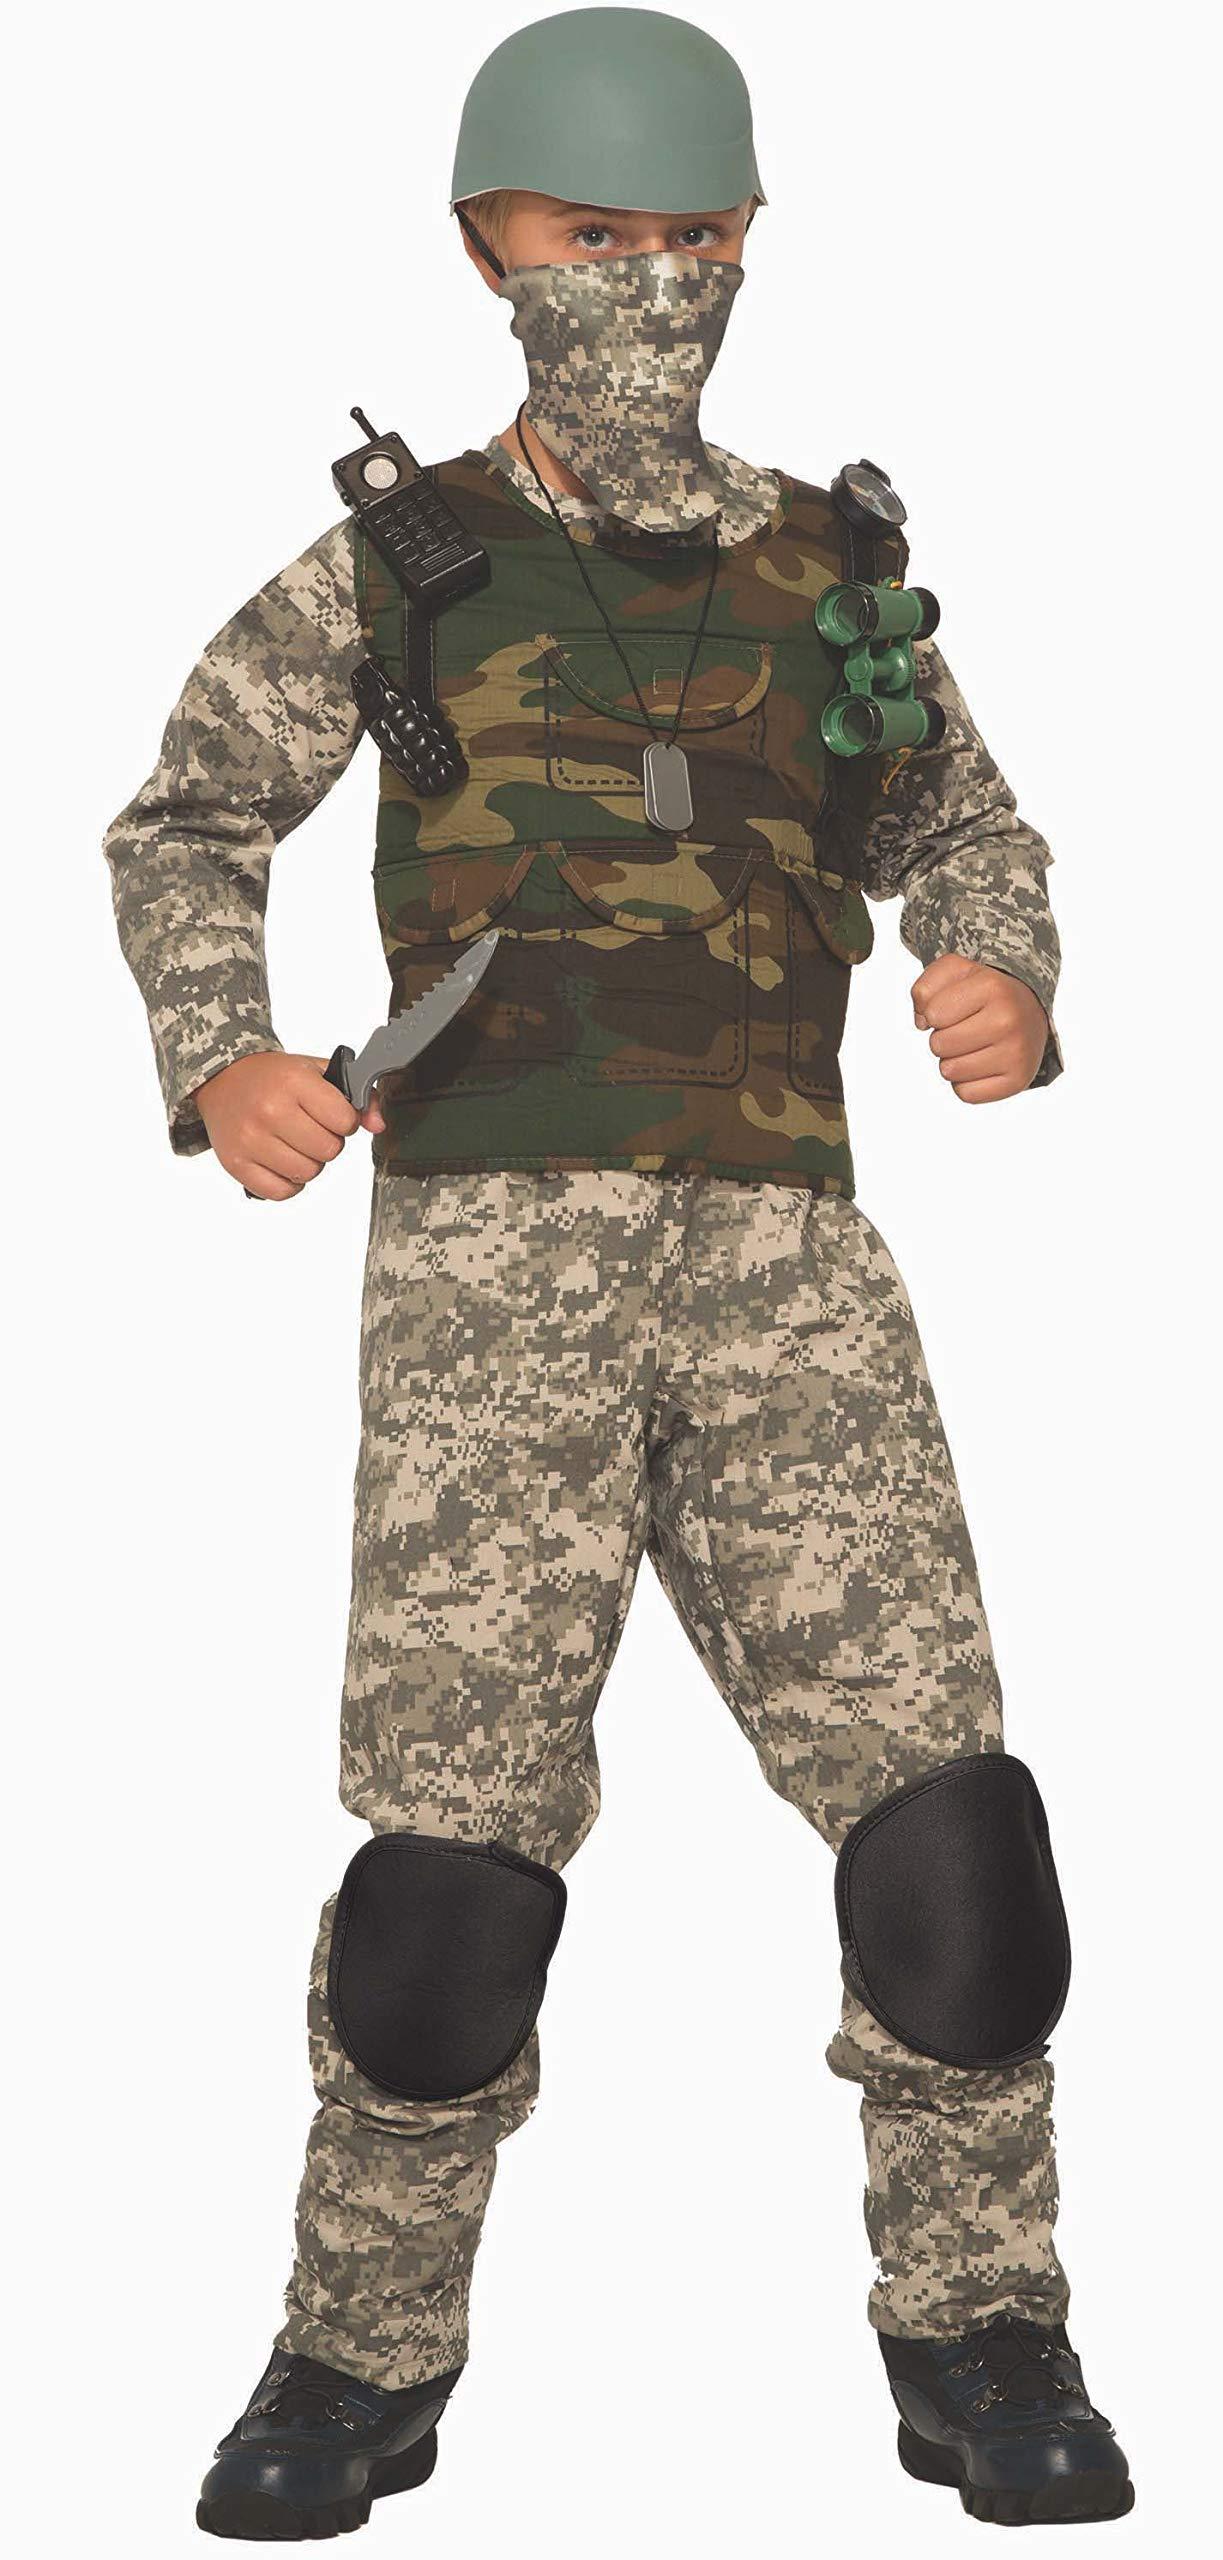 Forum Novelties Combat Trooper Child's Costume, Large by Forum Novelties